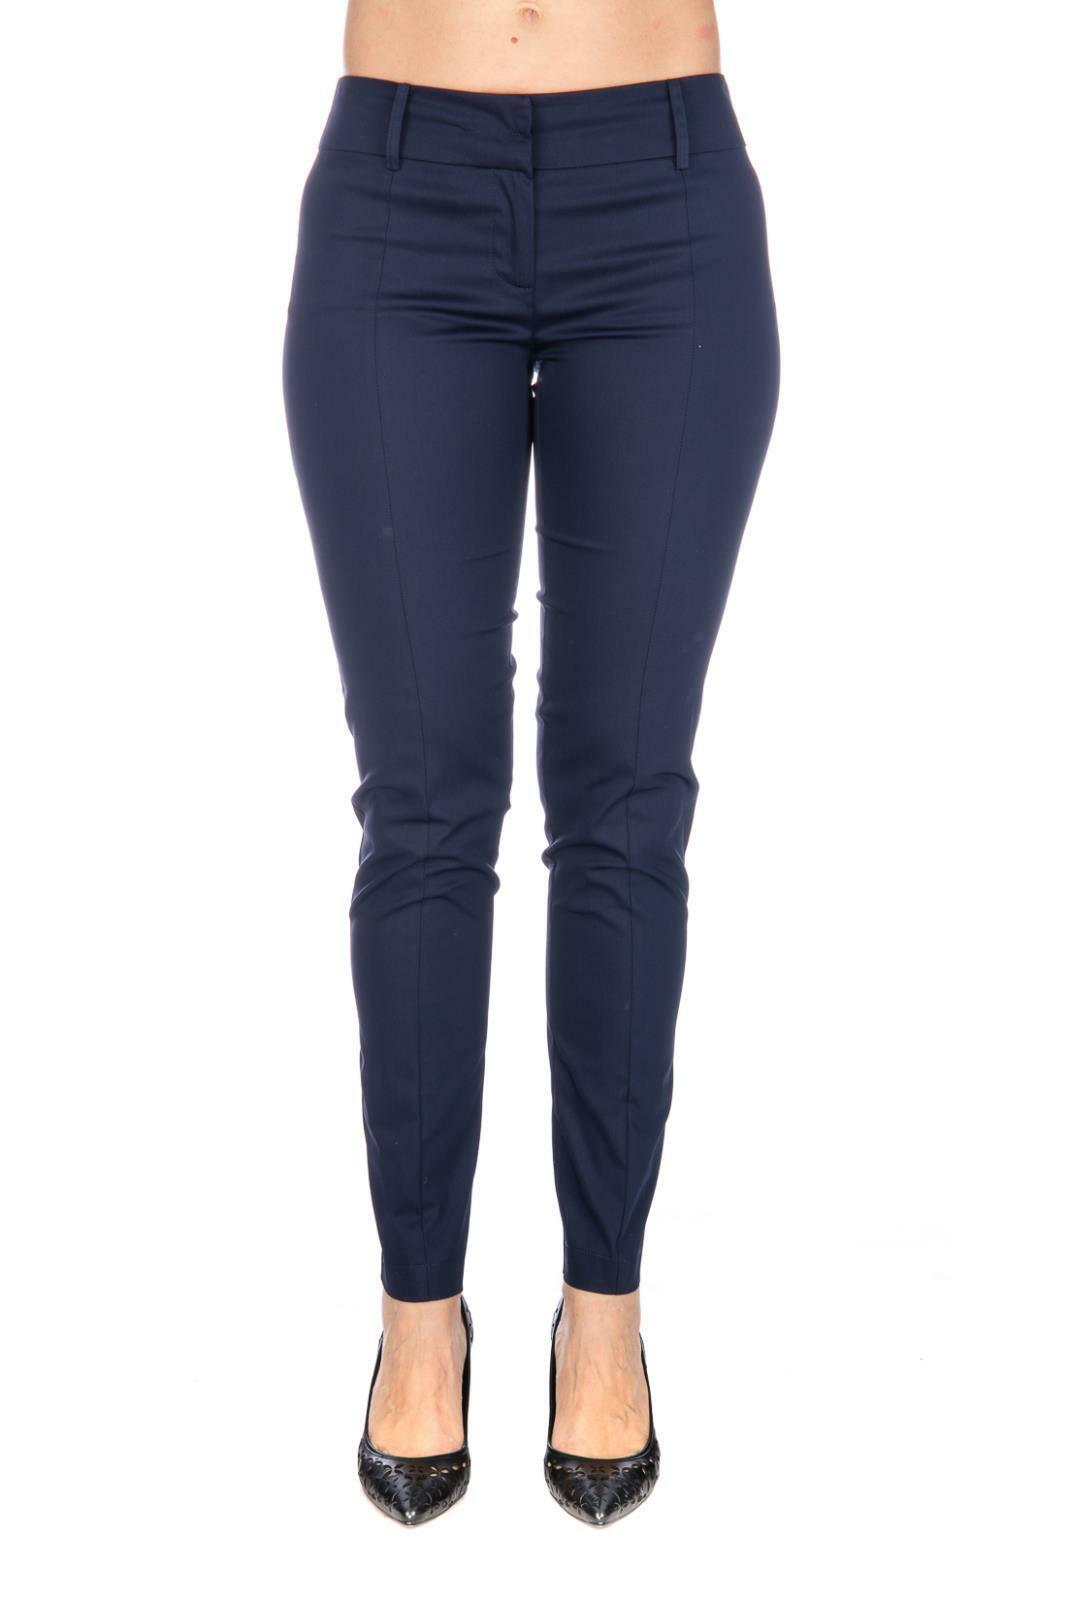 Pantalon Patrizia Pepe Femme en Gabardine de Coton Bleu BP0368 A2NJ C602 Lapis